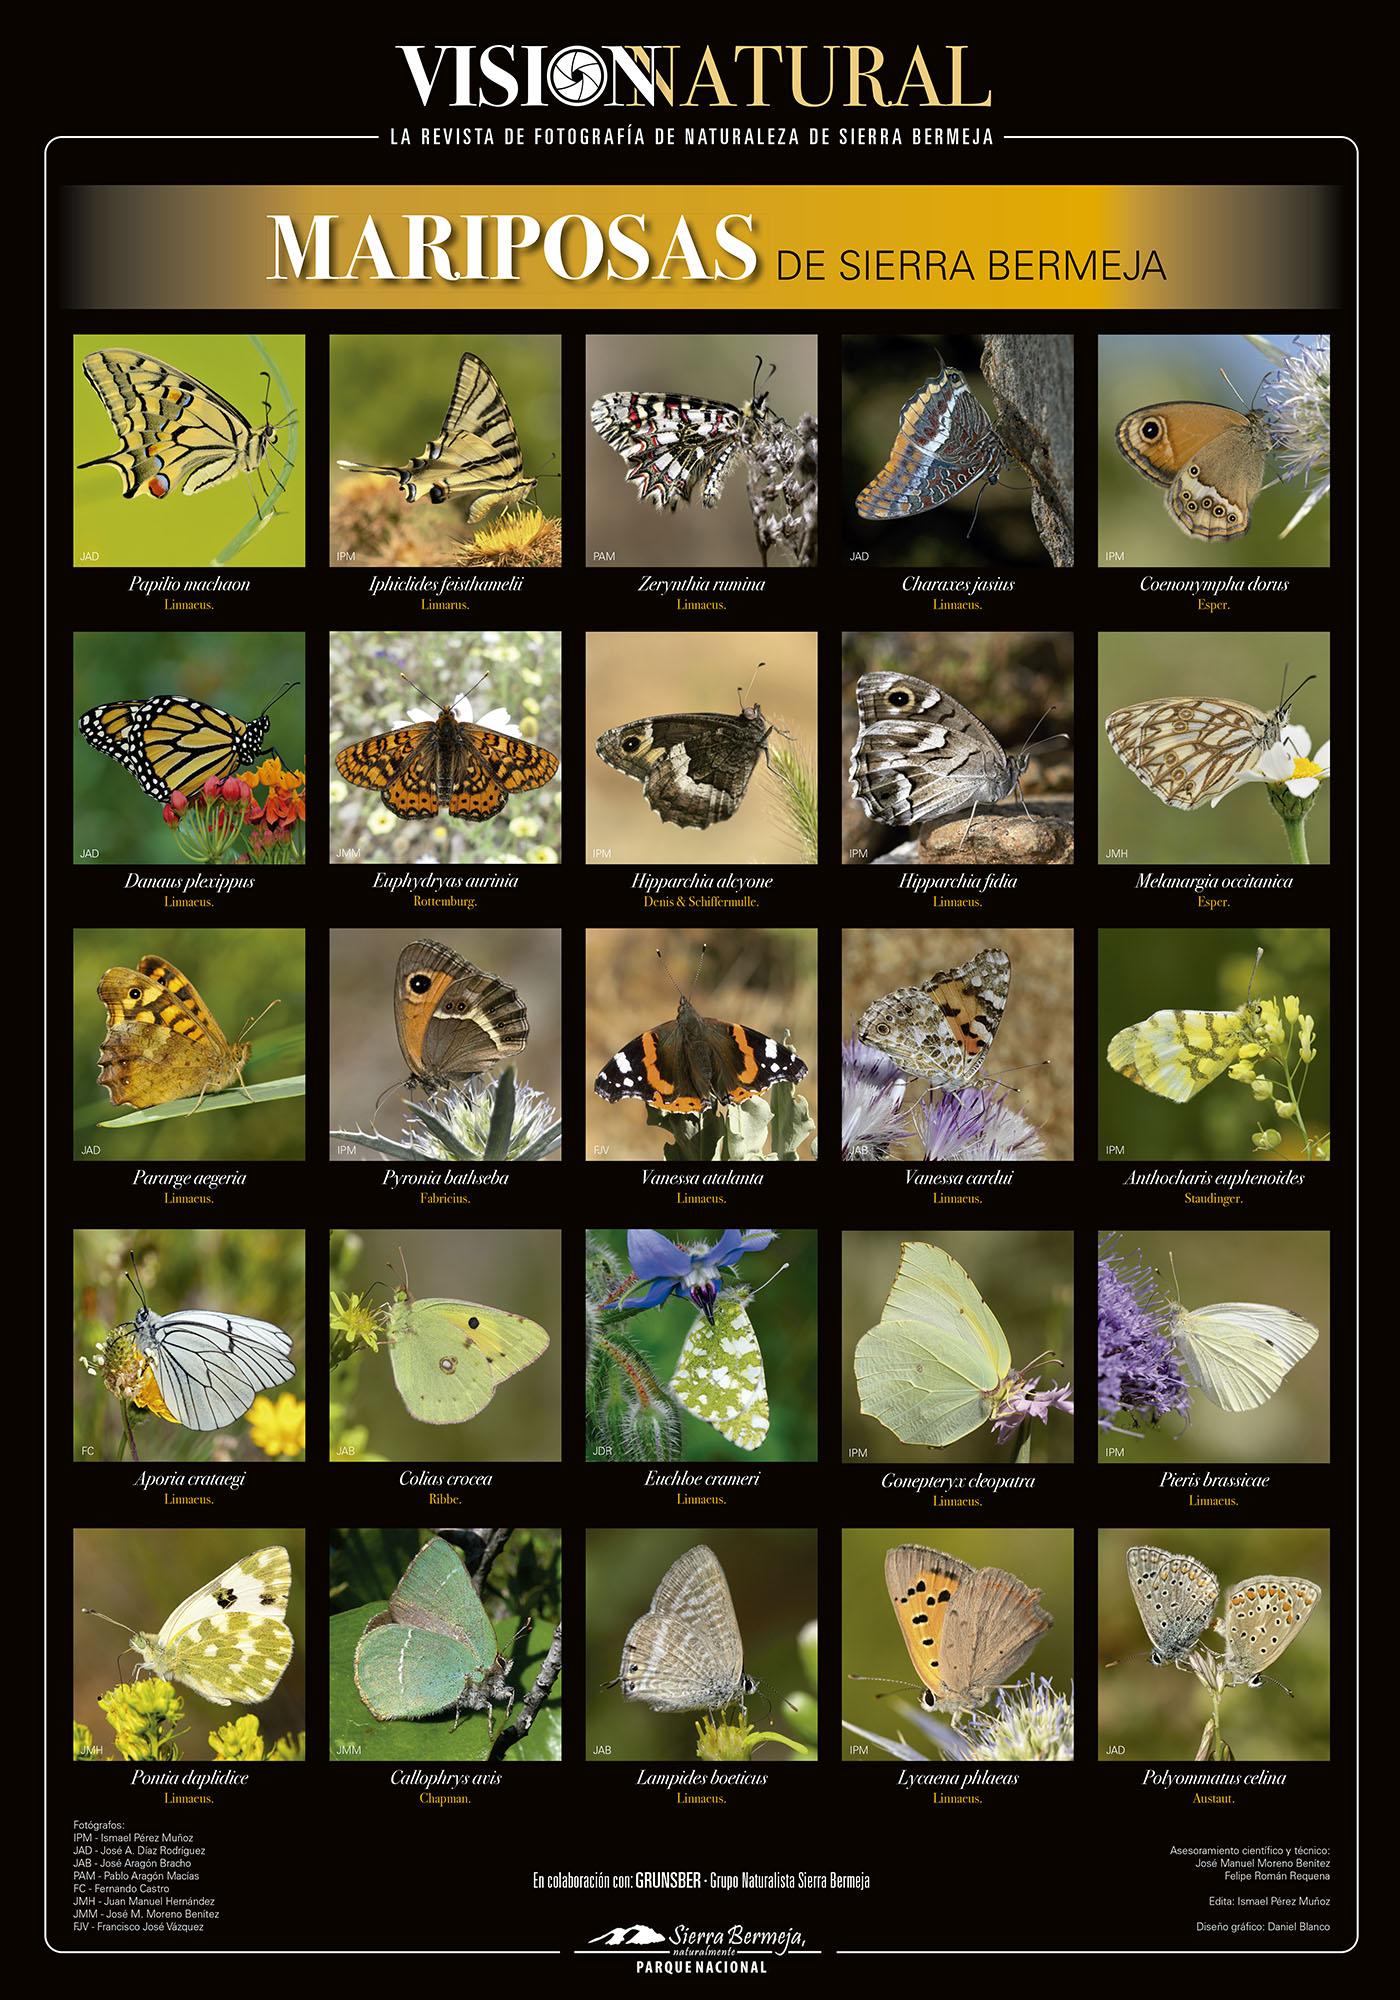 Mariposas de Sierra Bermeja